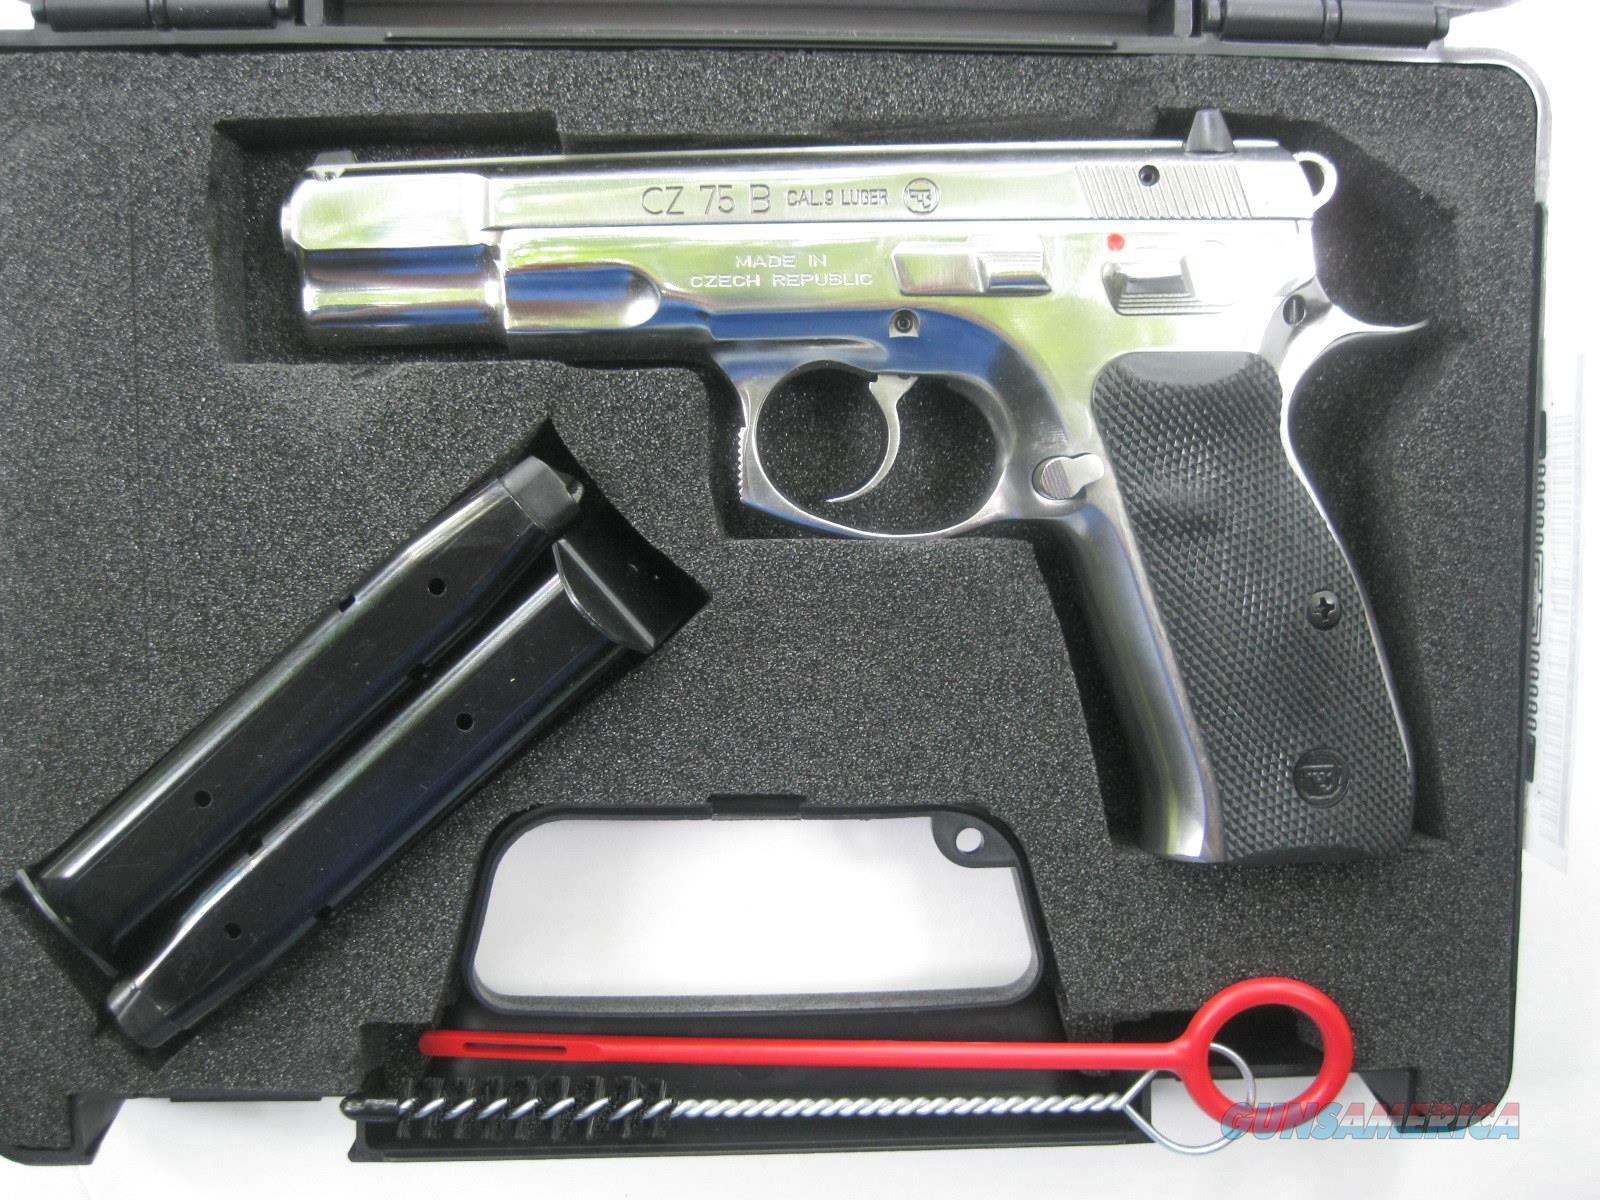 CZ 75B 9mm High Polished Stainless 10 Rd 01108 *NIB*  Guns > Pistols > CZ Pistols